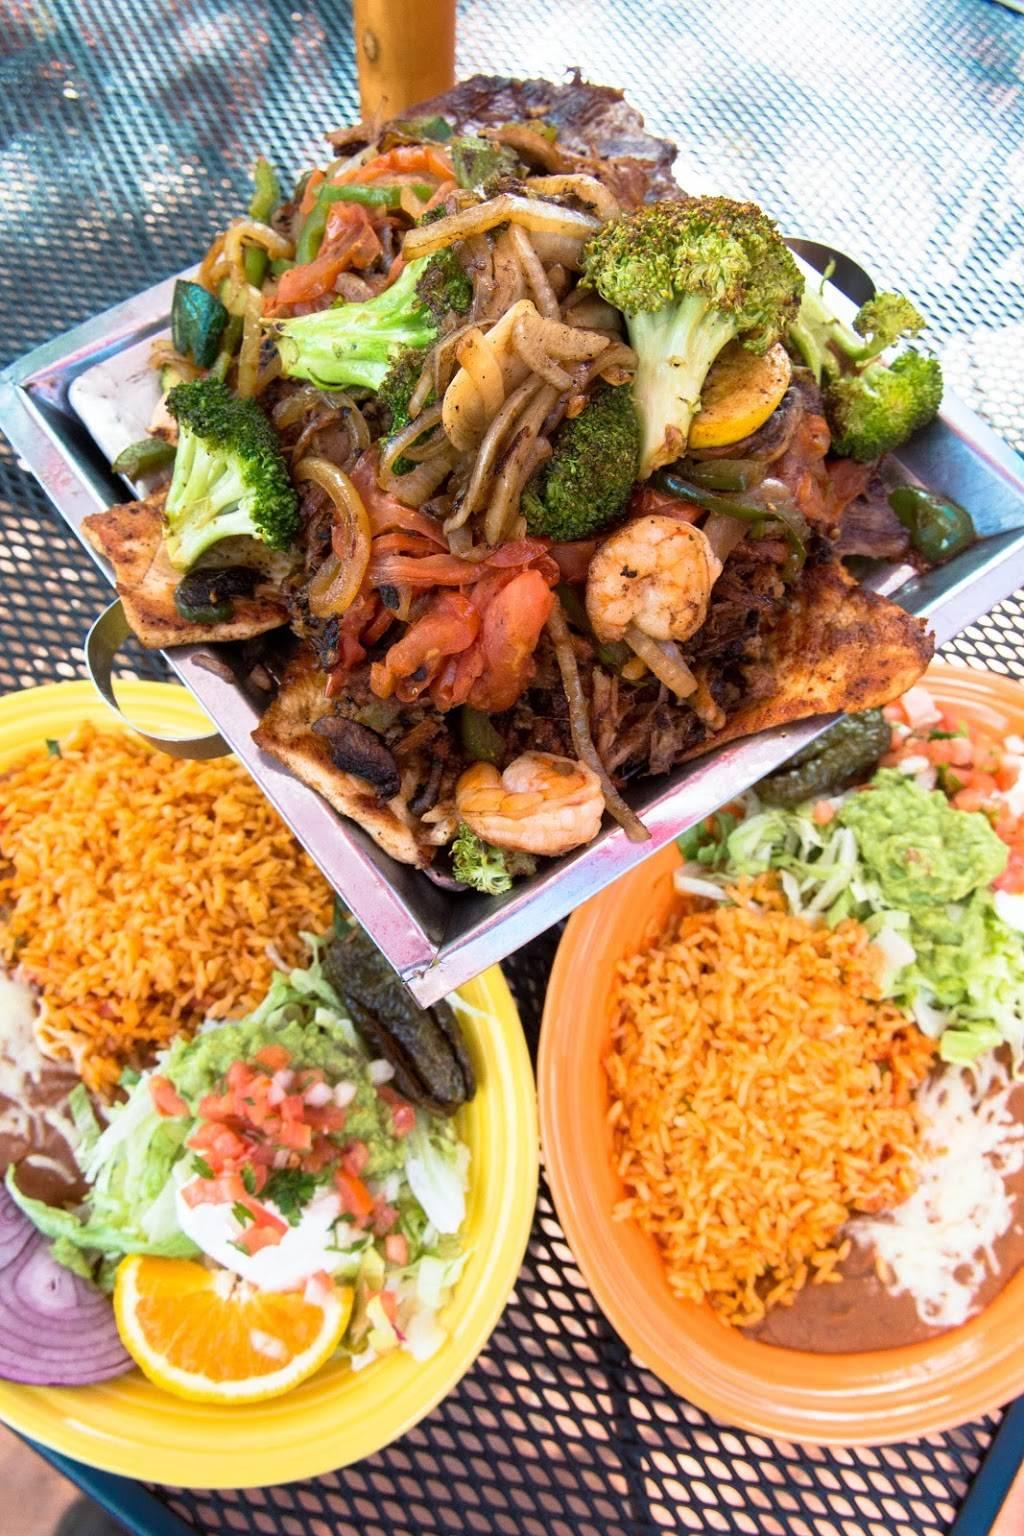 El Cerro Restaurant - restaurant  | Photo 7 of 7 | Address: 2217 Avent Ferry Rd, Raleigh, NC 27606, USA | Phone: (919) 832-0293